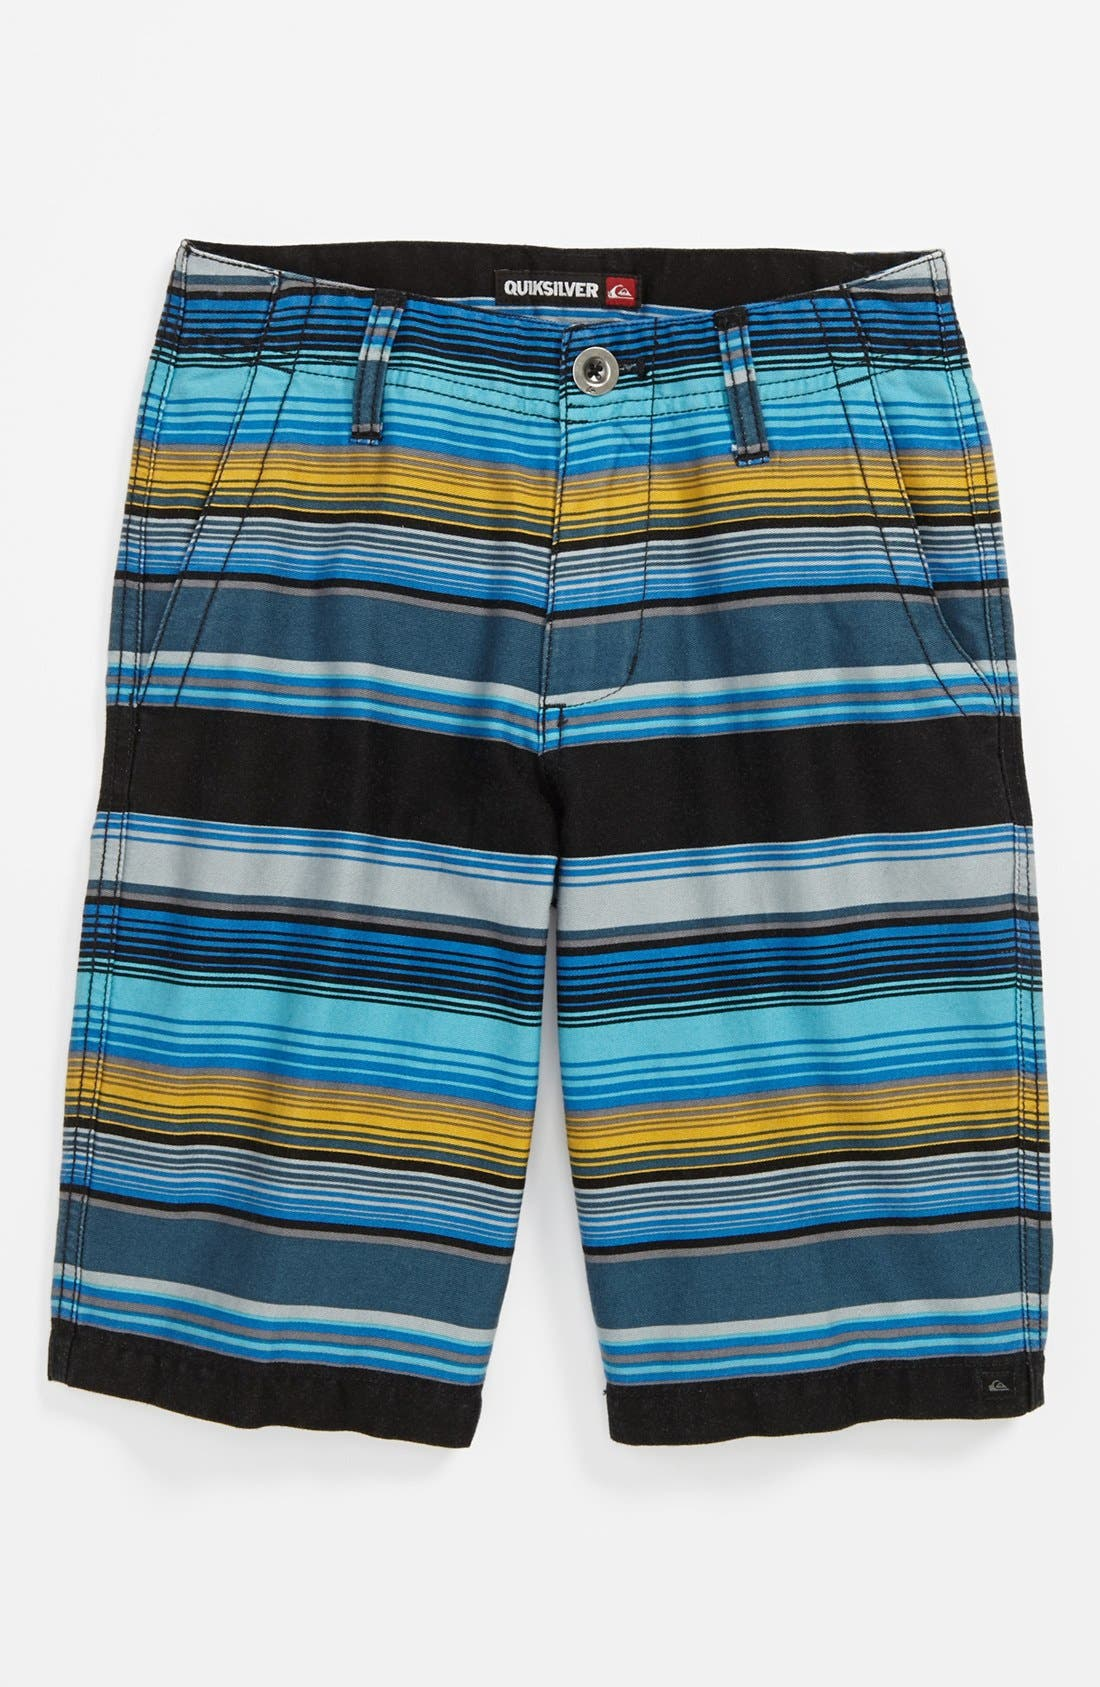 Alternate Image 1 Selected - Quiksilver 'Snappa' Walking Shorts (Big Boys)